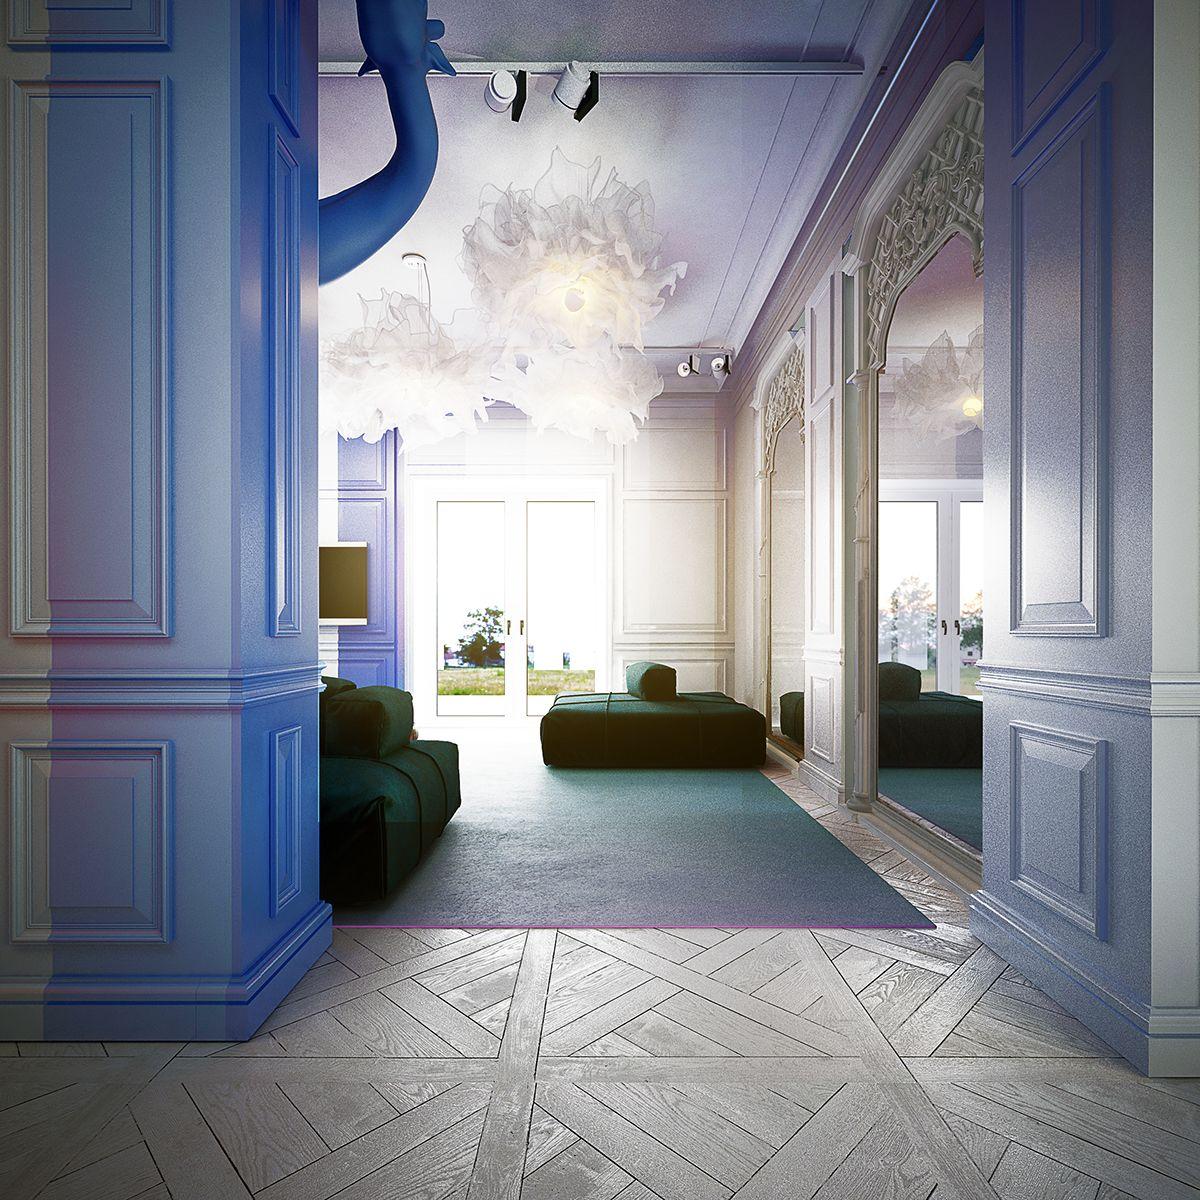 R Class Interior Design On Behance In 2019 Interior Interior